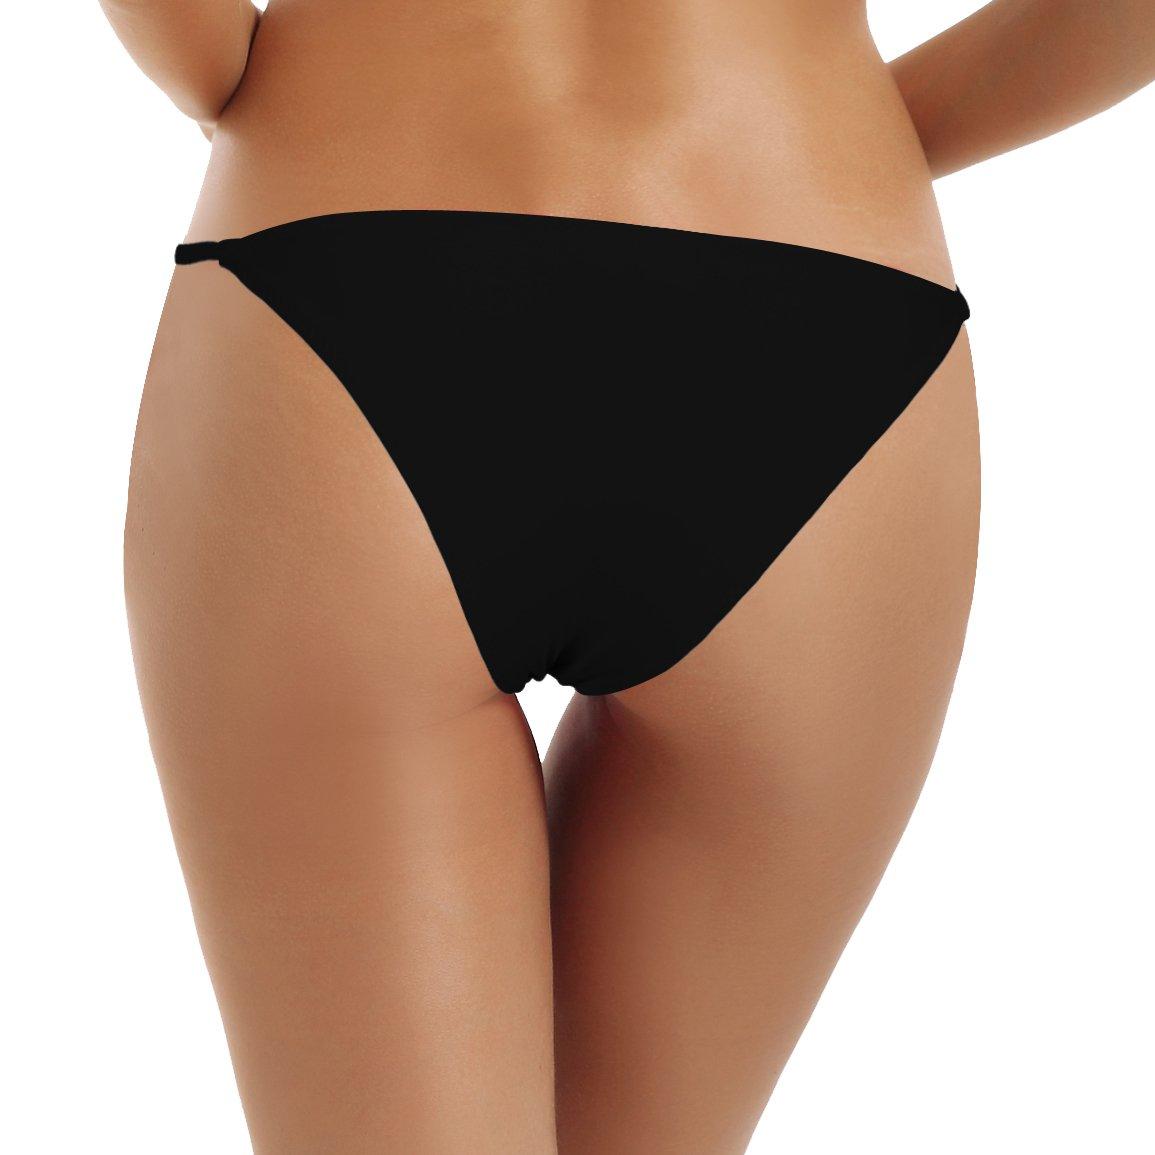 Reteron Women's Sexy String Side Bathing Suit Bottoms 2 Pack (Black DarkRed, XL) by Reteron (Image #2)